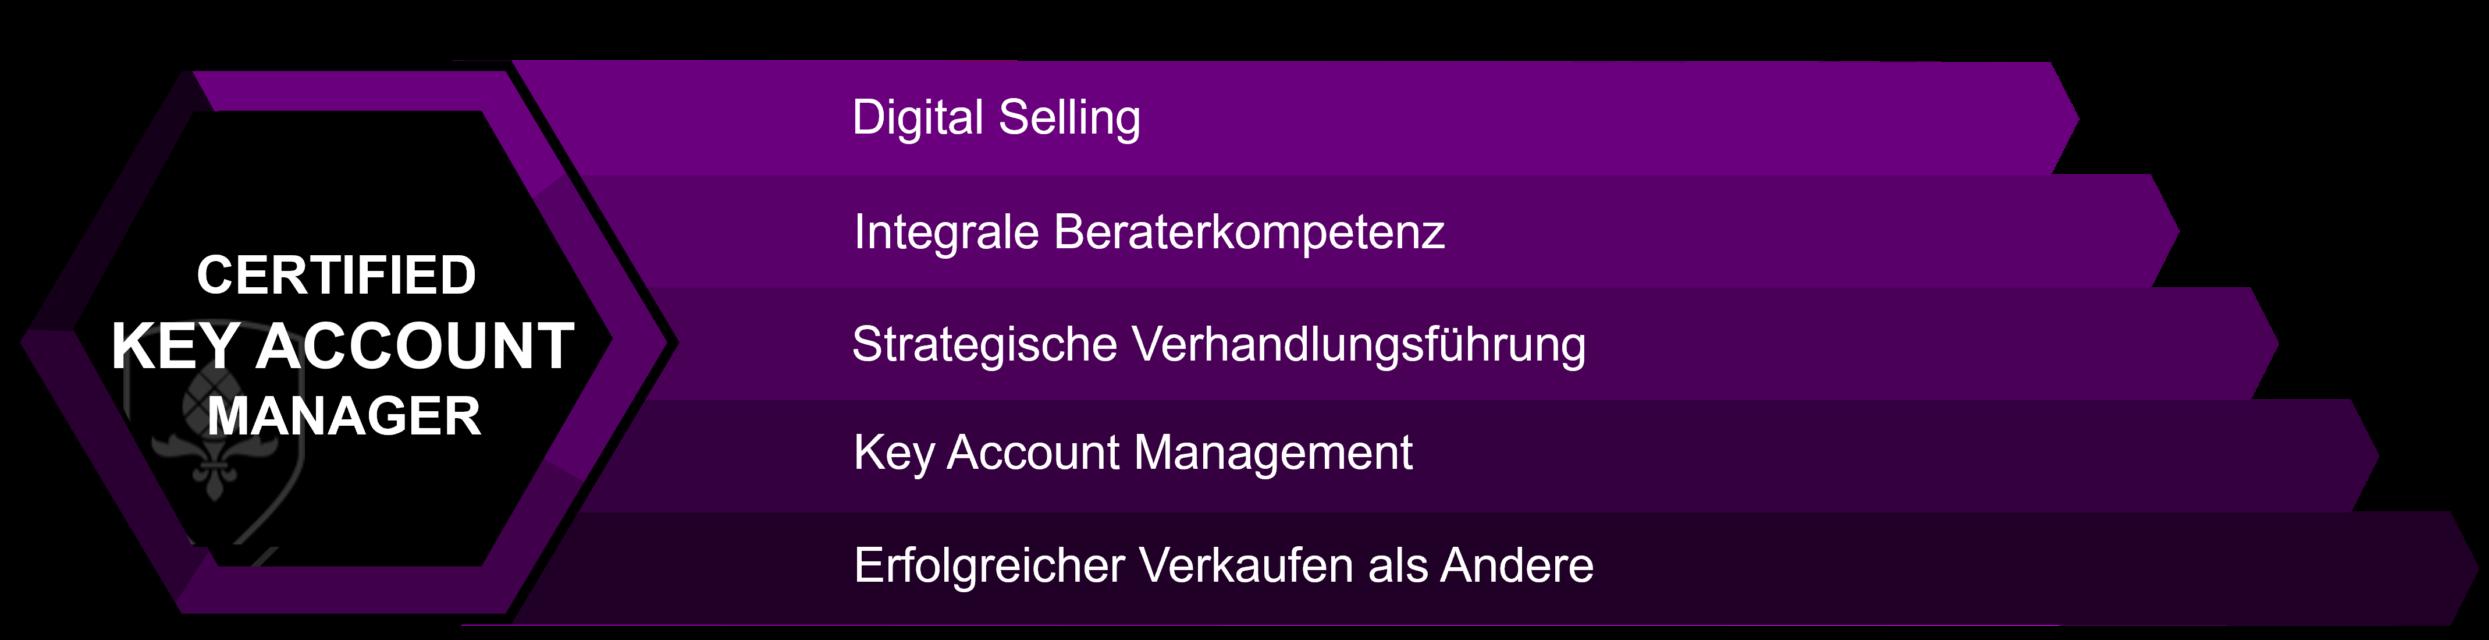 Sales und Key Account Manager